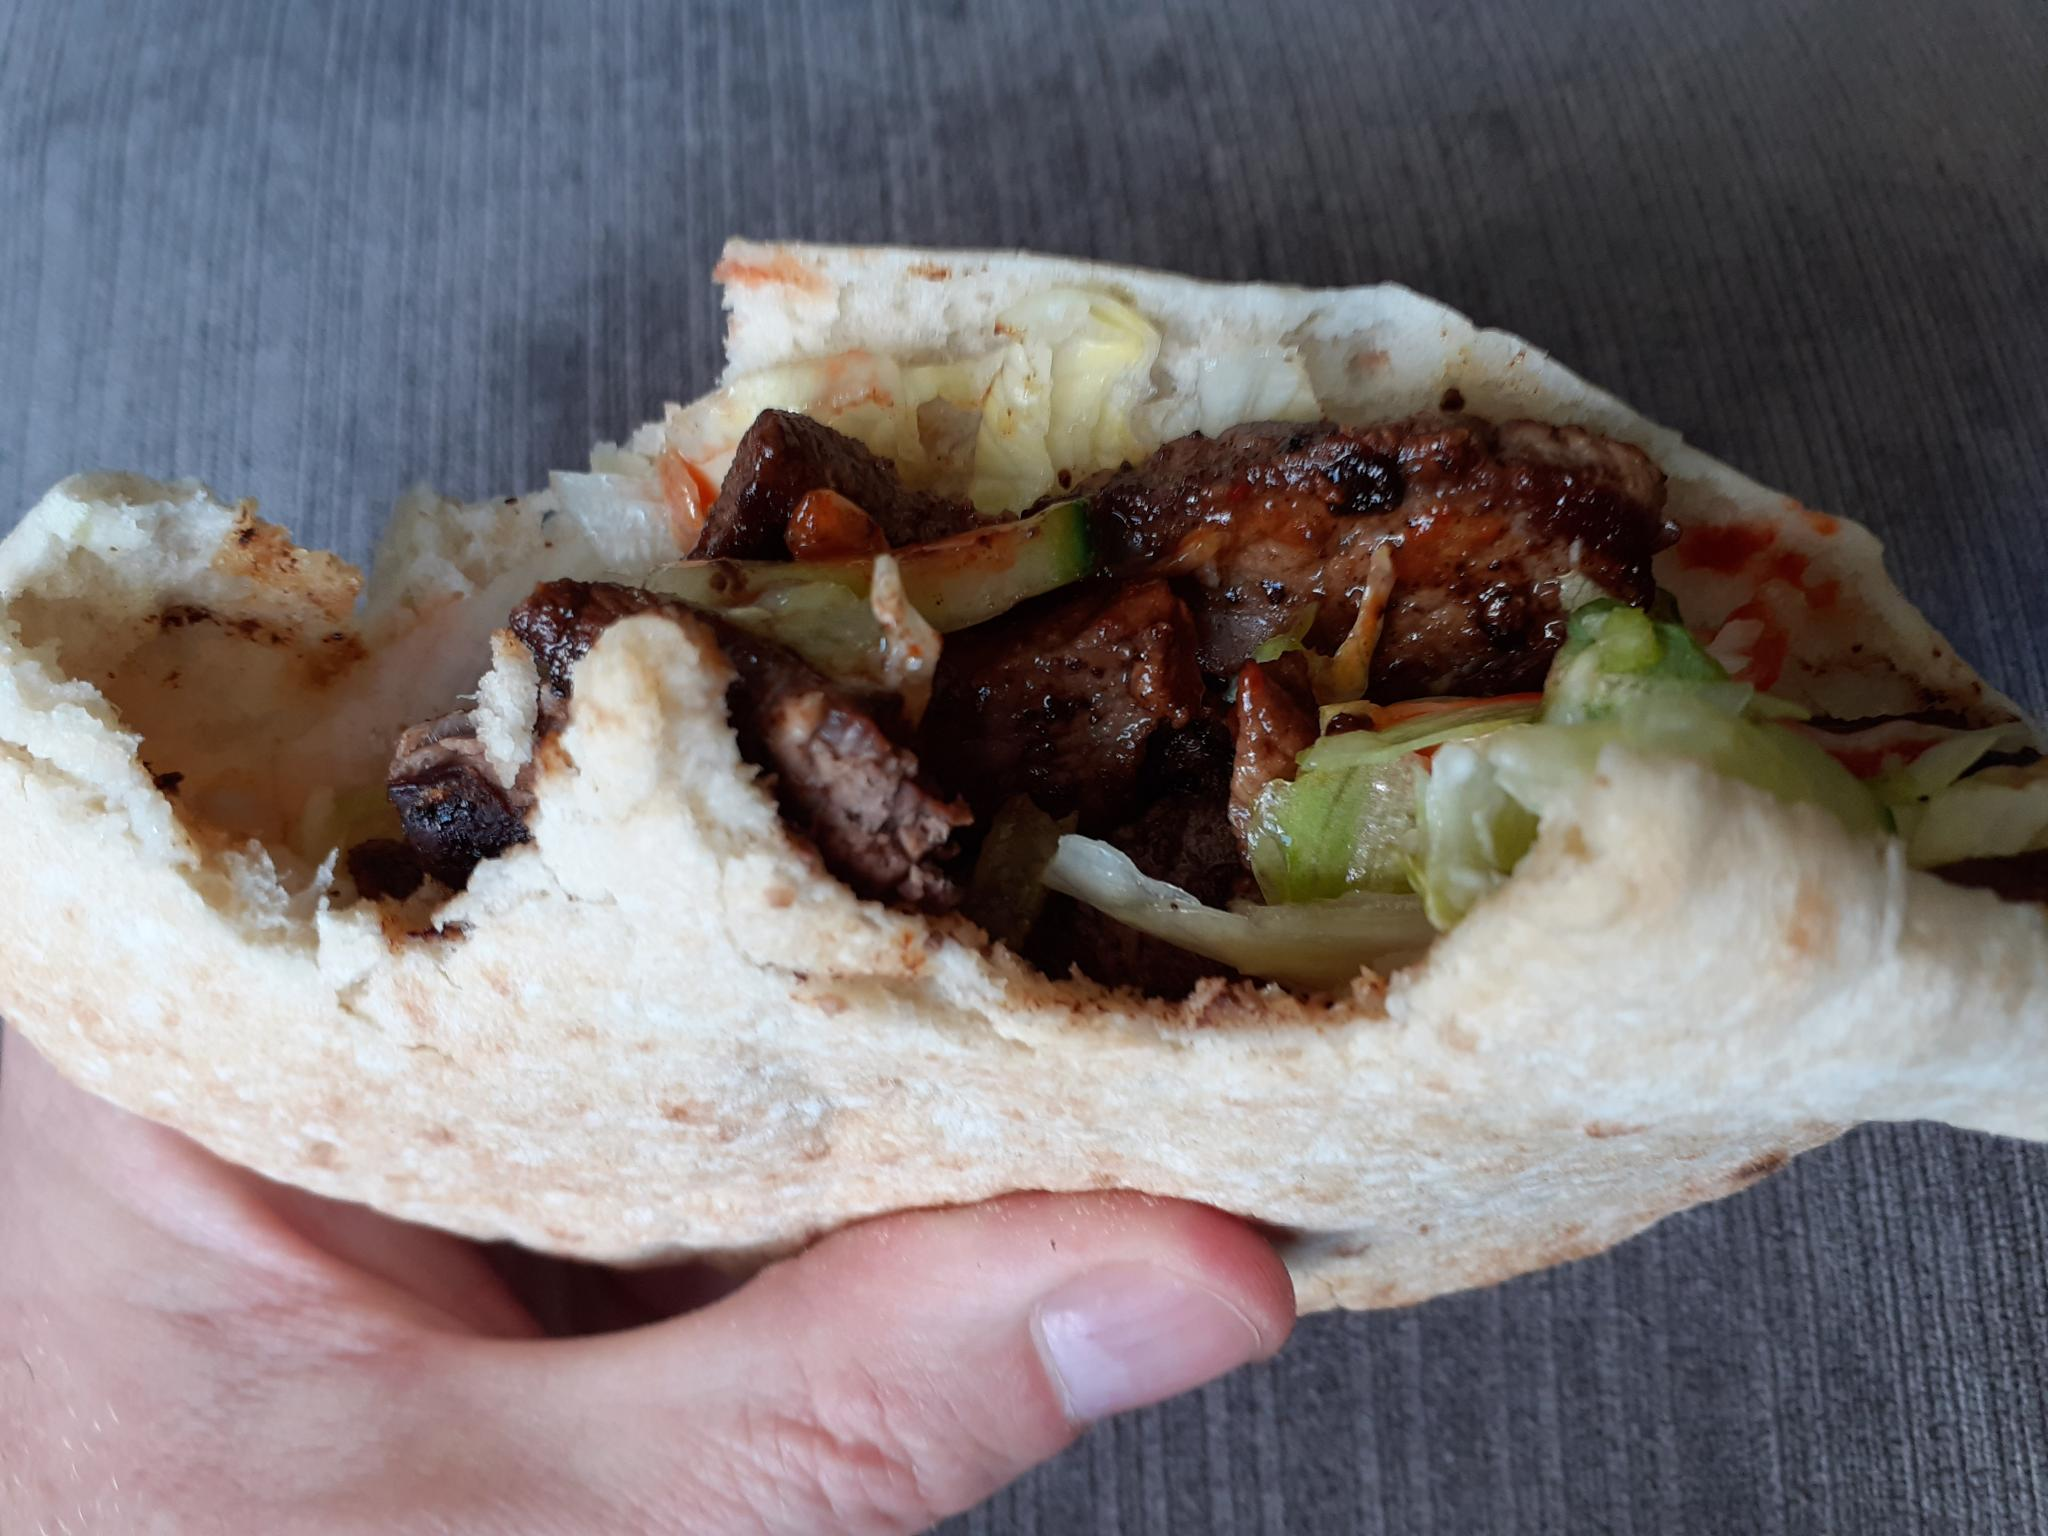 Chittys 5 minute half time dirty kebab-20200919_152934-jpg